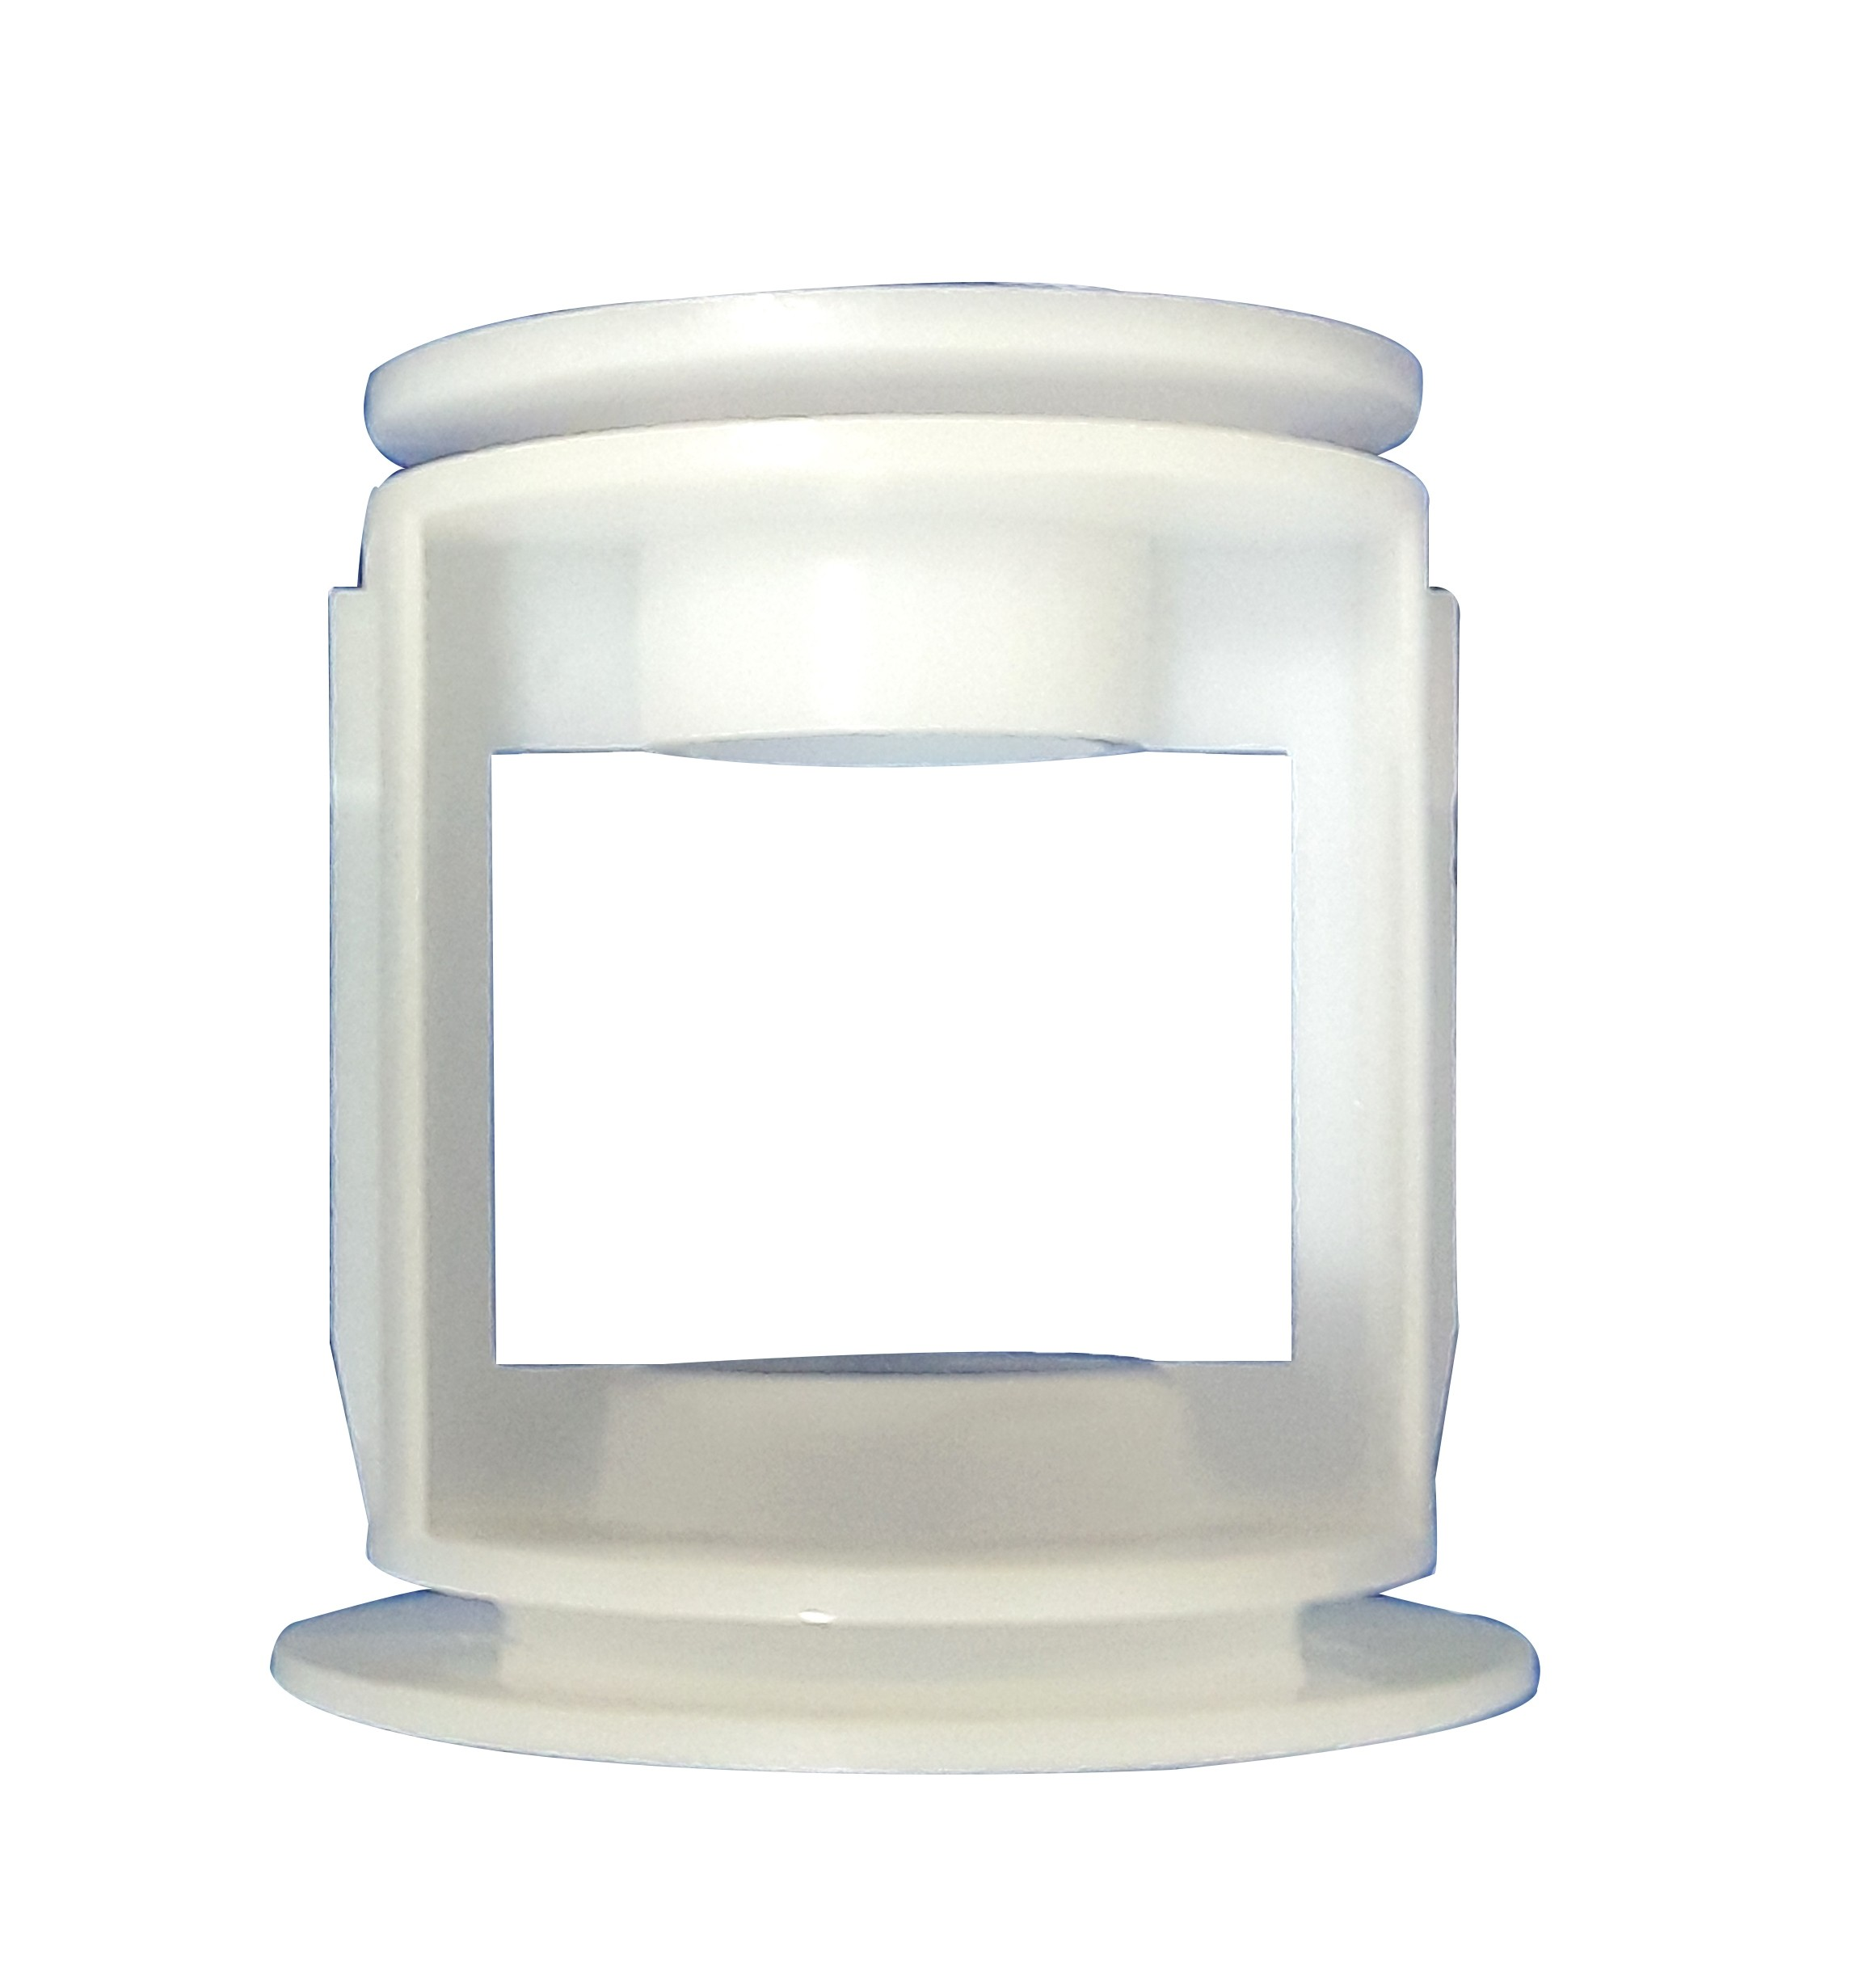 802426P, Assy Lid W/Filter Insert Pkg